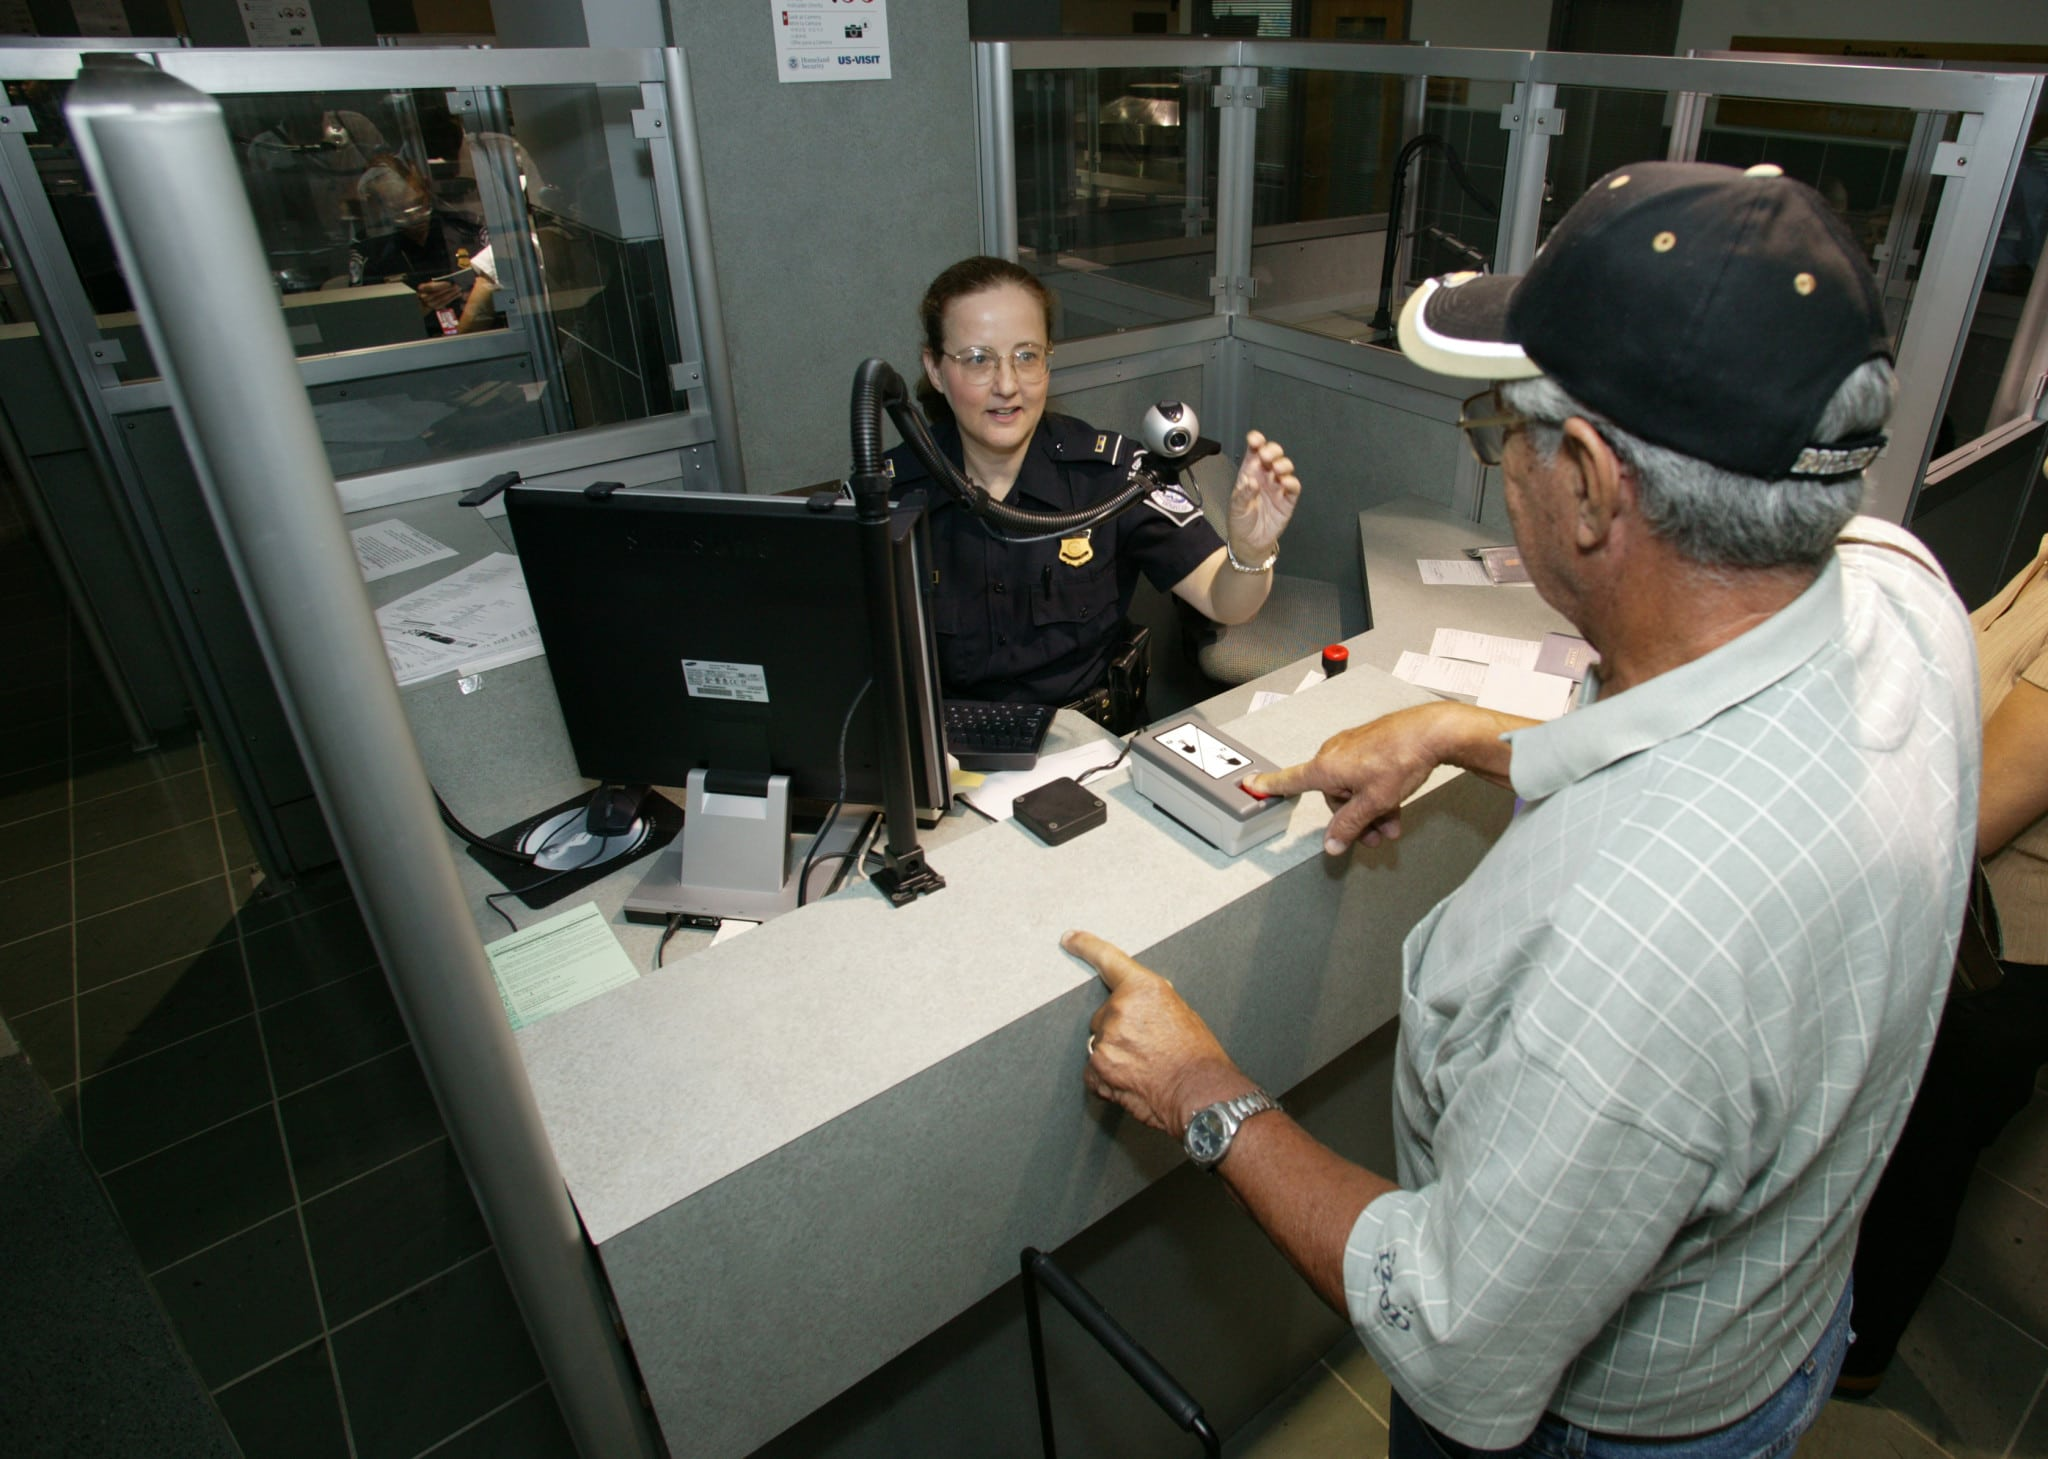 cbp officer resume customs and border protection officer salary how by ayan cbp officer resume customs cbp officer job description